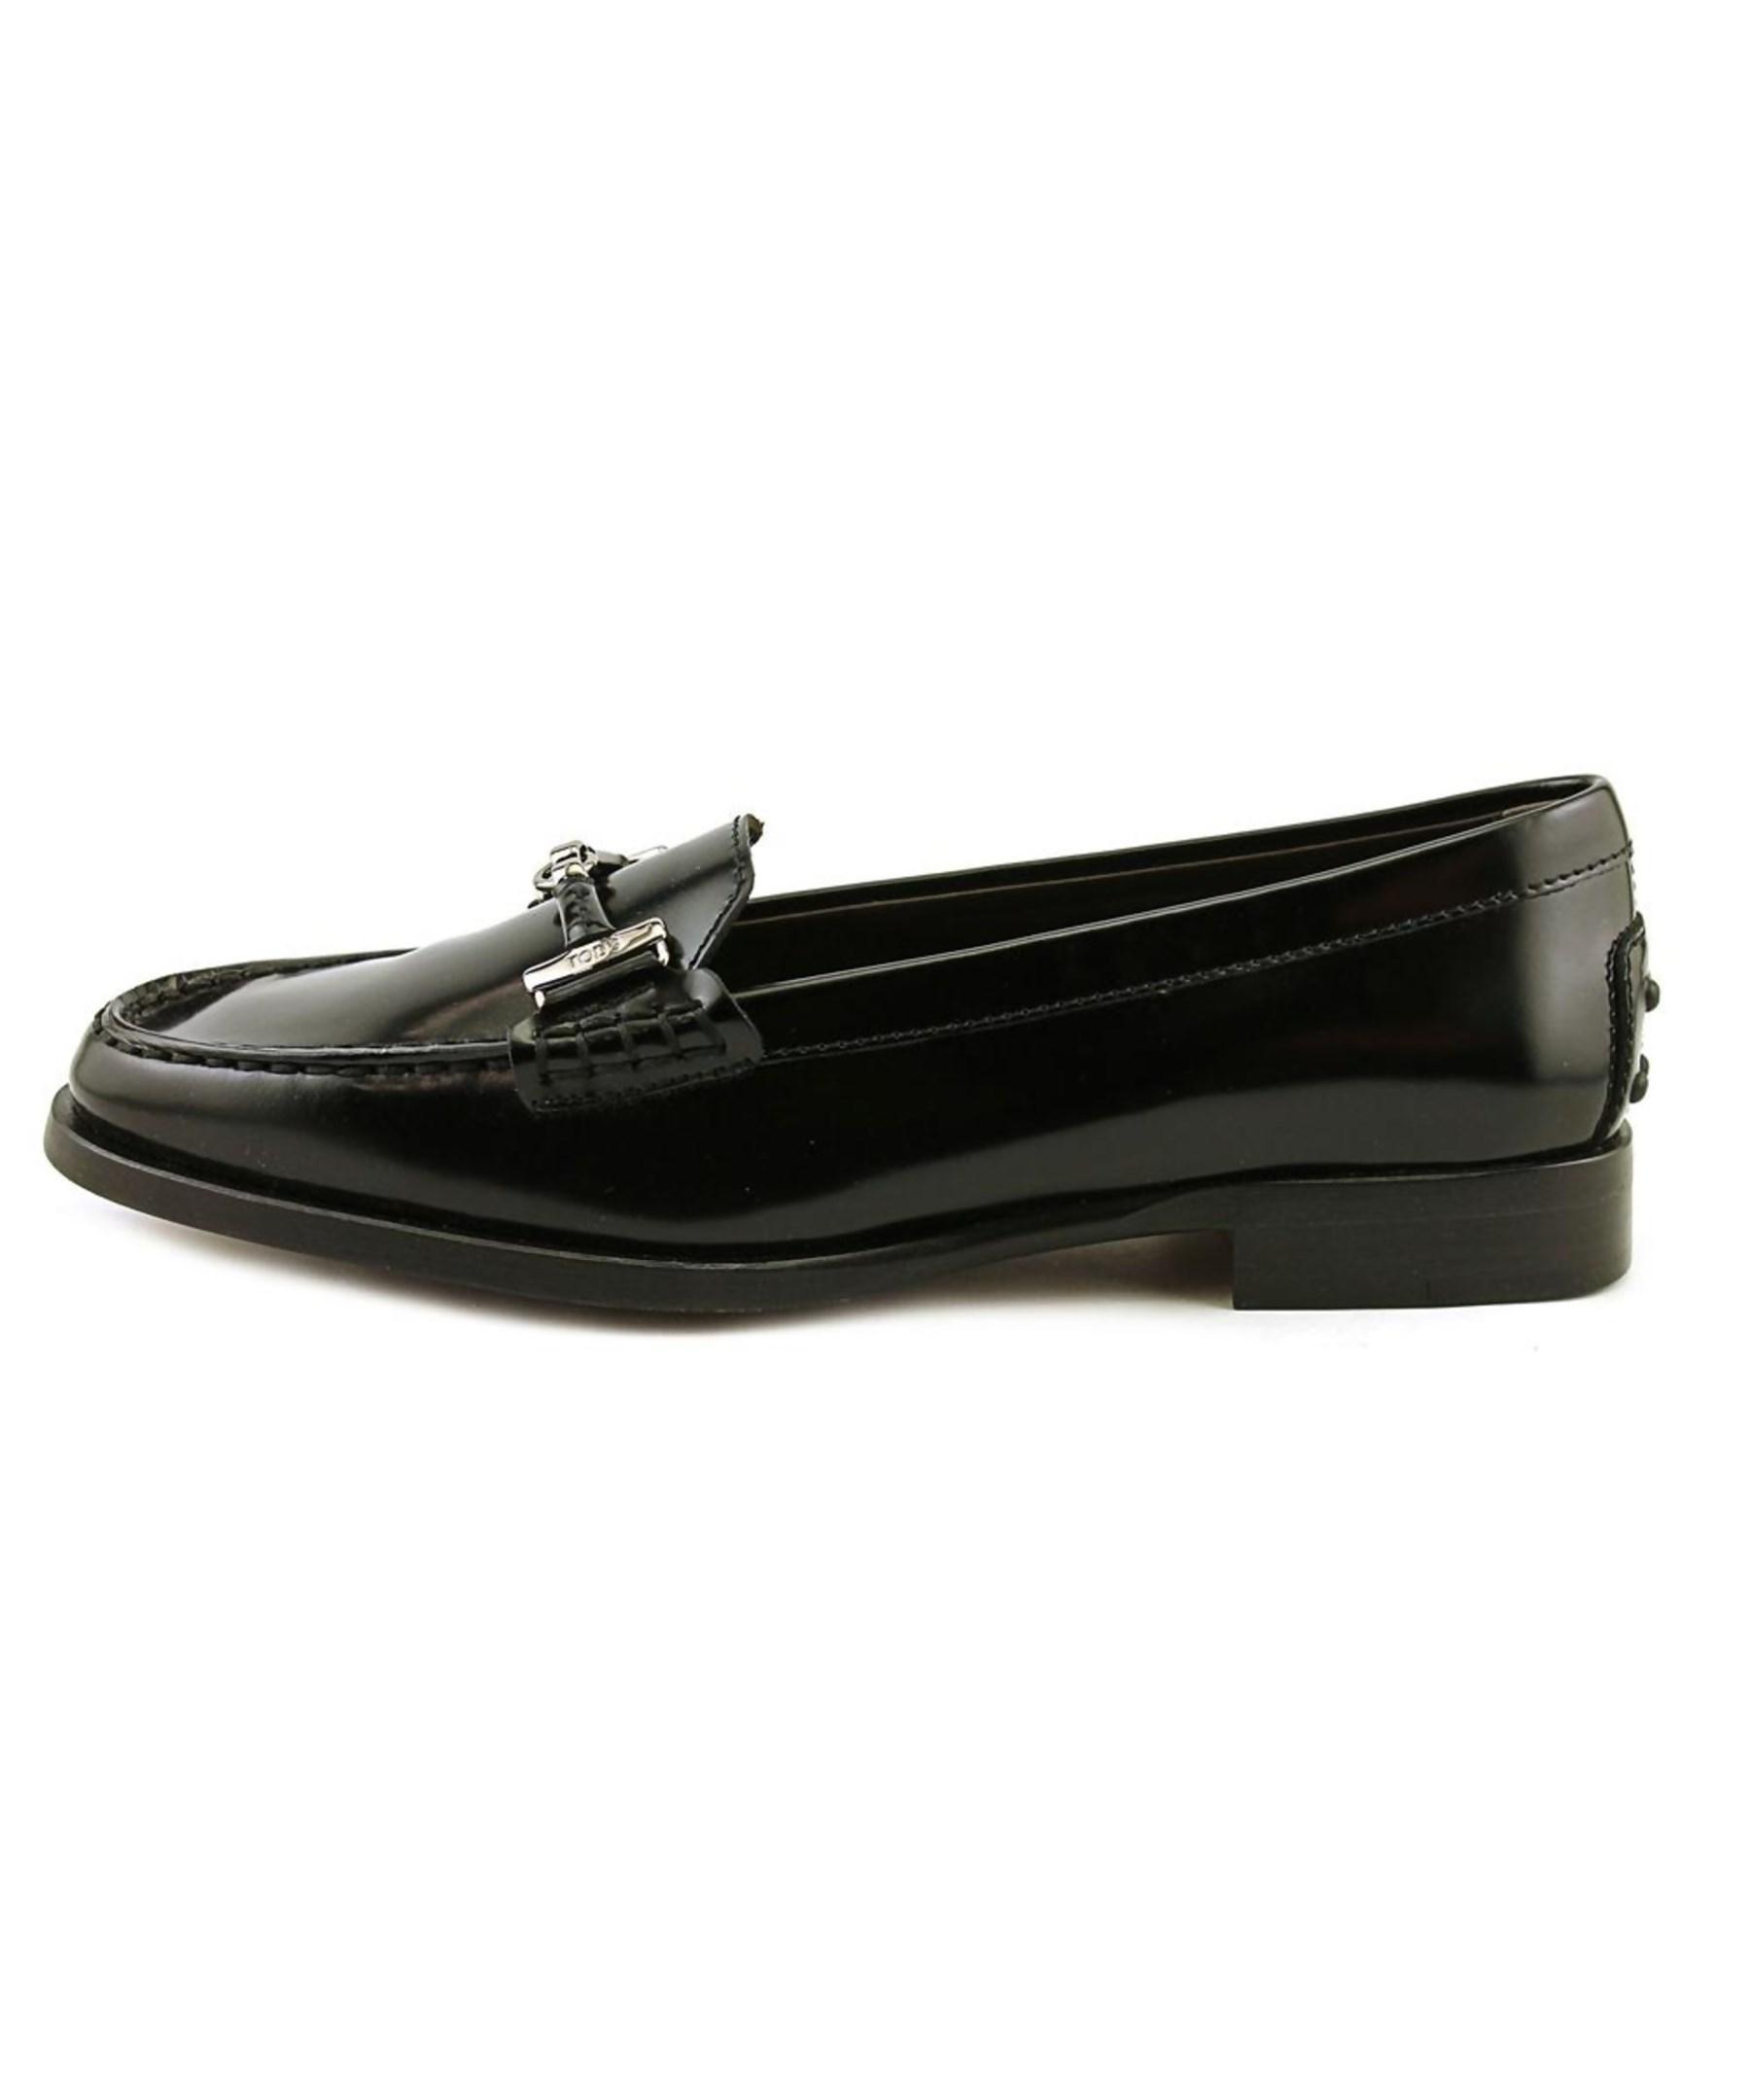 80e5f70f4c9 Lyst - Tod S N. Citta Doppia T Pelle Youth Apron Toe Leather Black ...